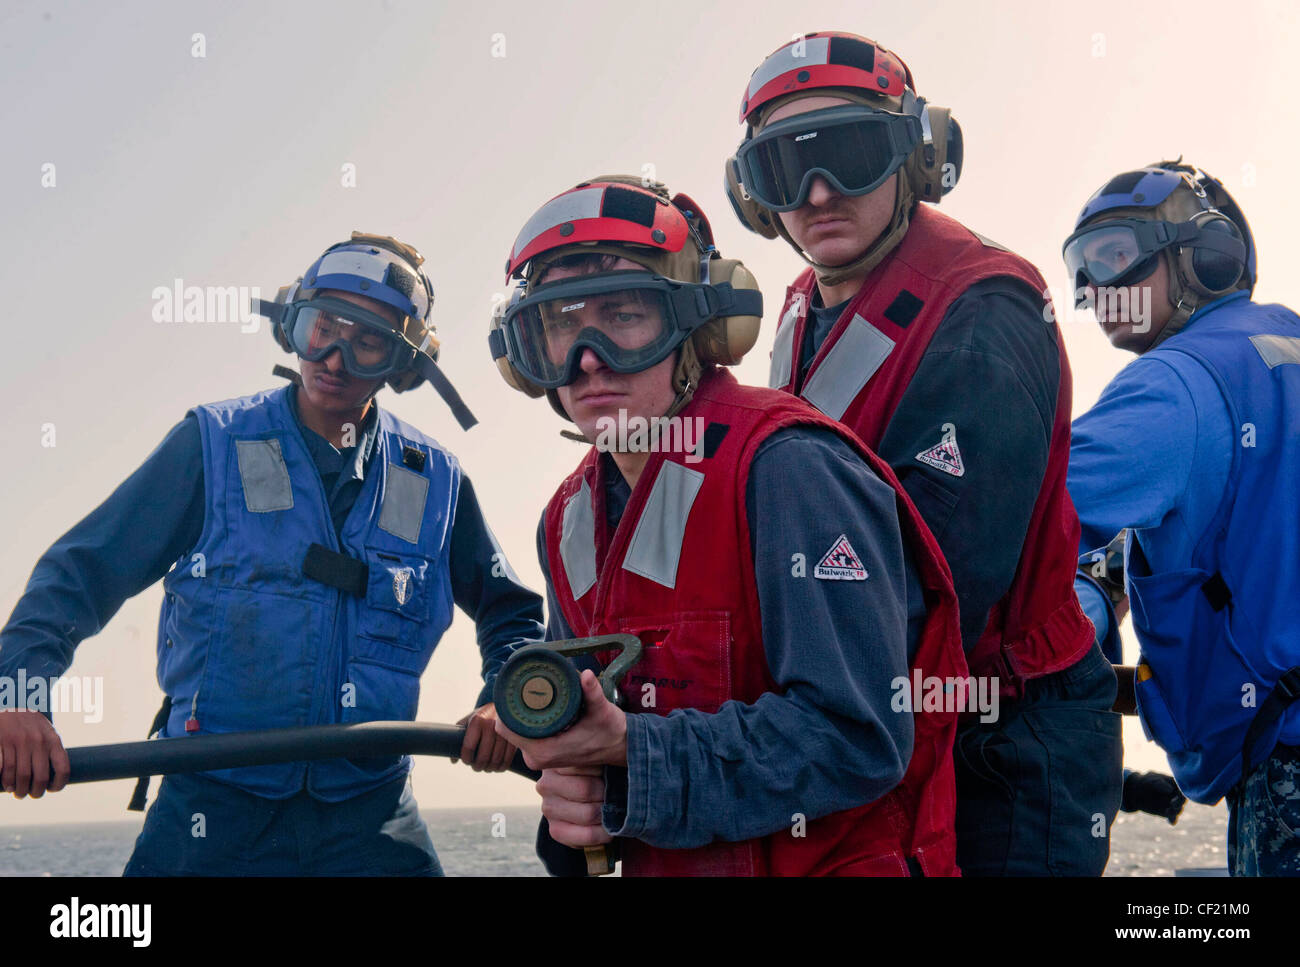 ARABIAN SEA (Feb. 21, 2012) Damage Controlman Fireman Keith Modisette and Damage Controlman 3rd Class Nicholas Fisher - Stock Image